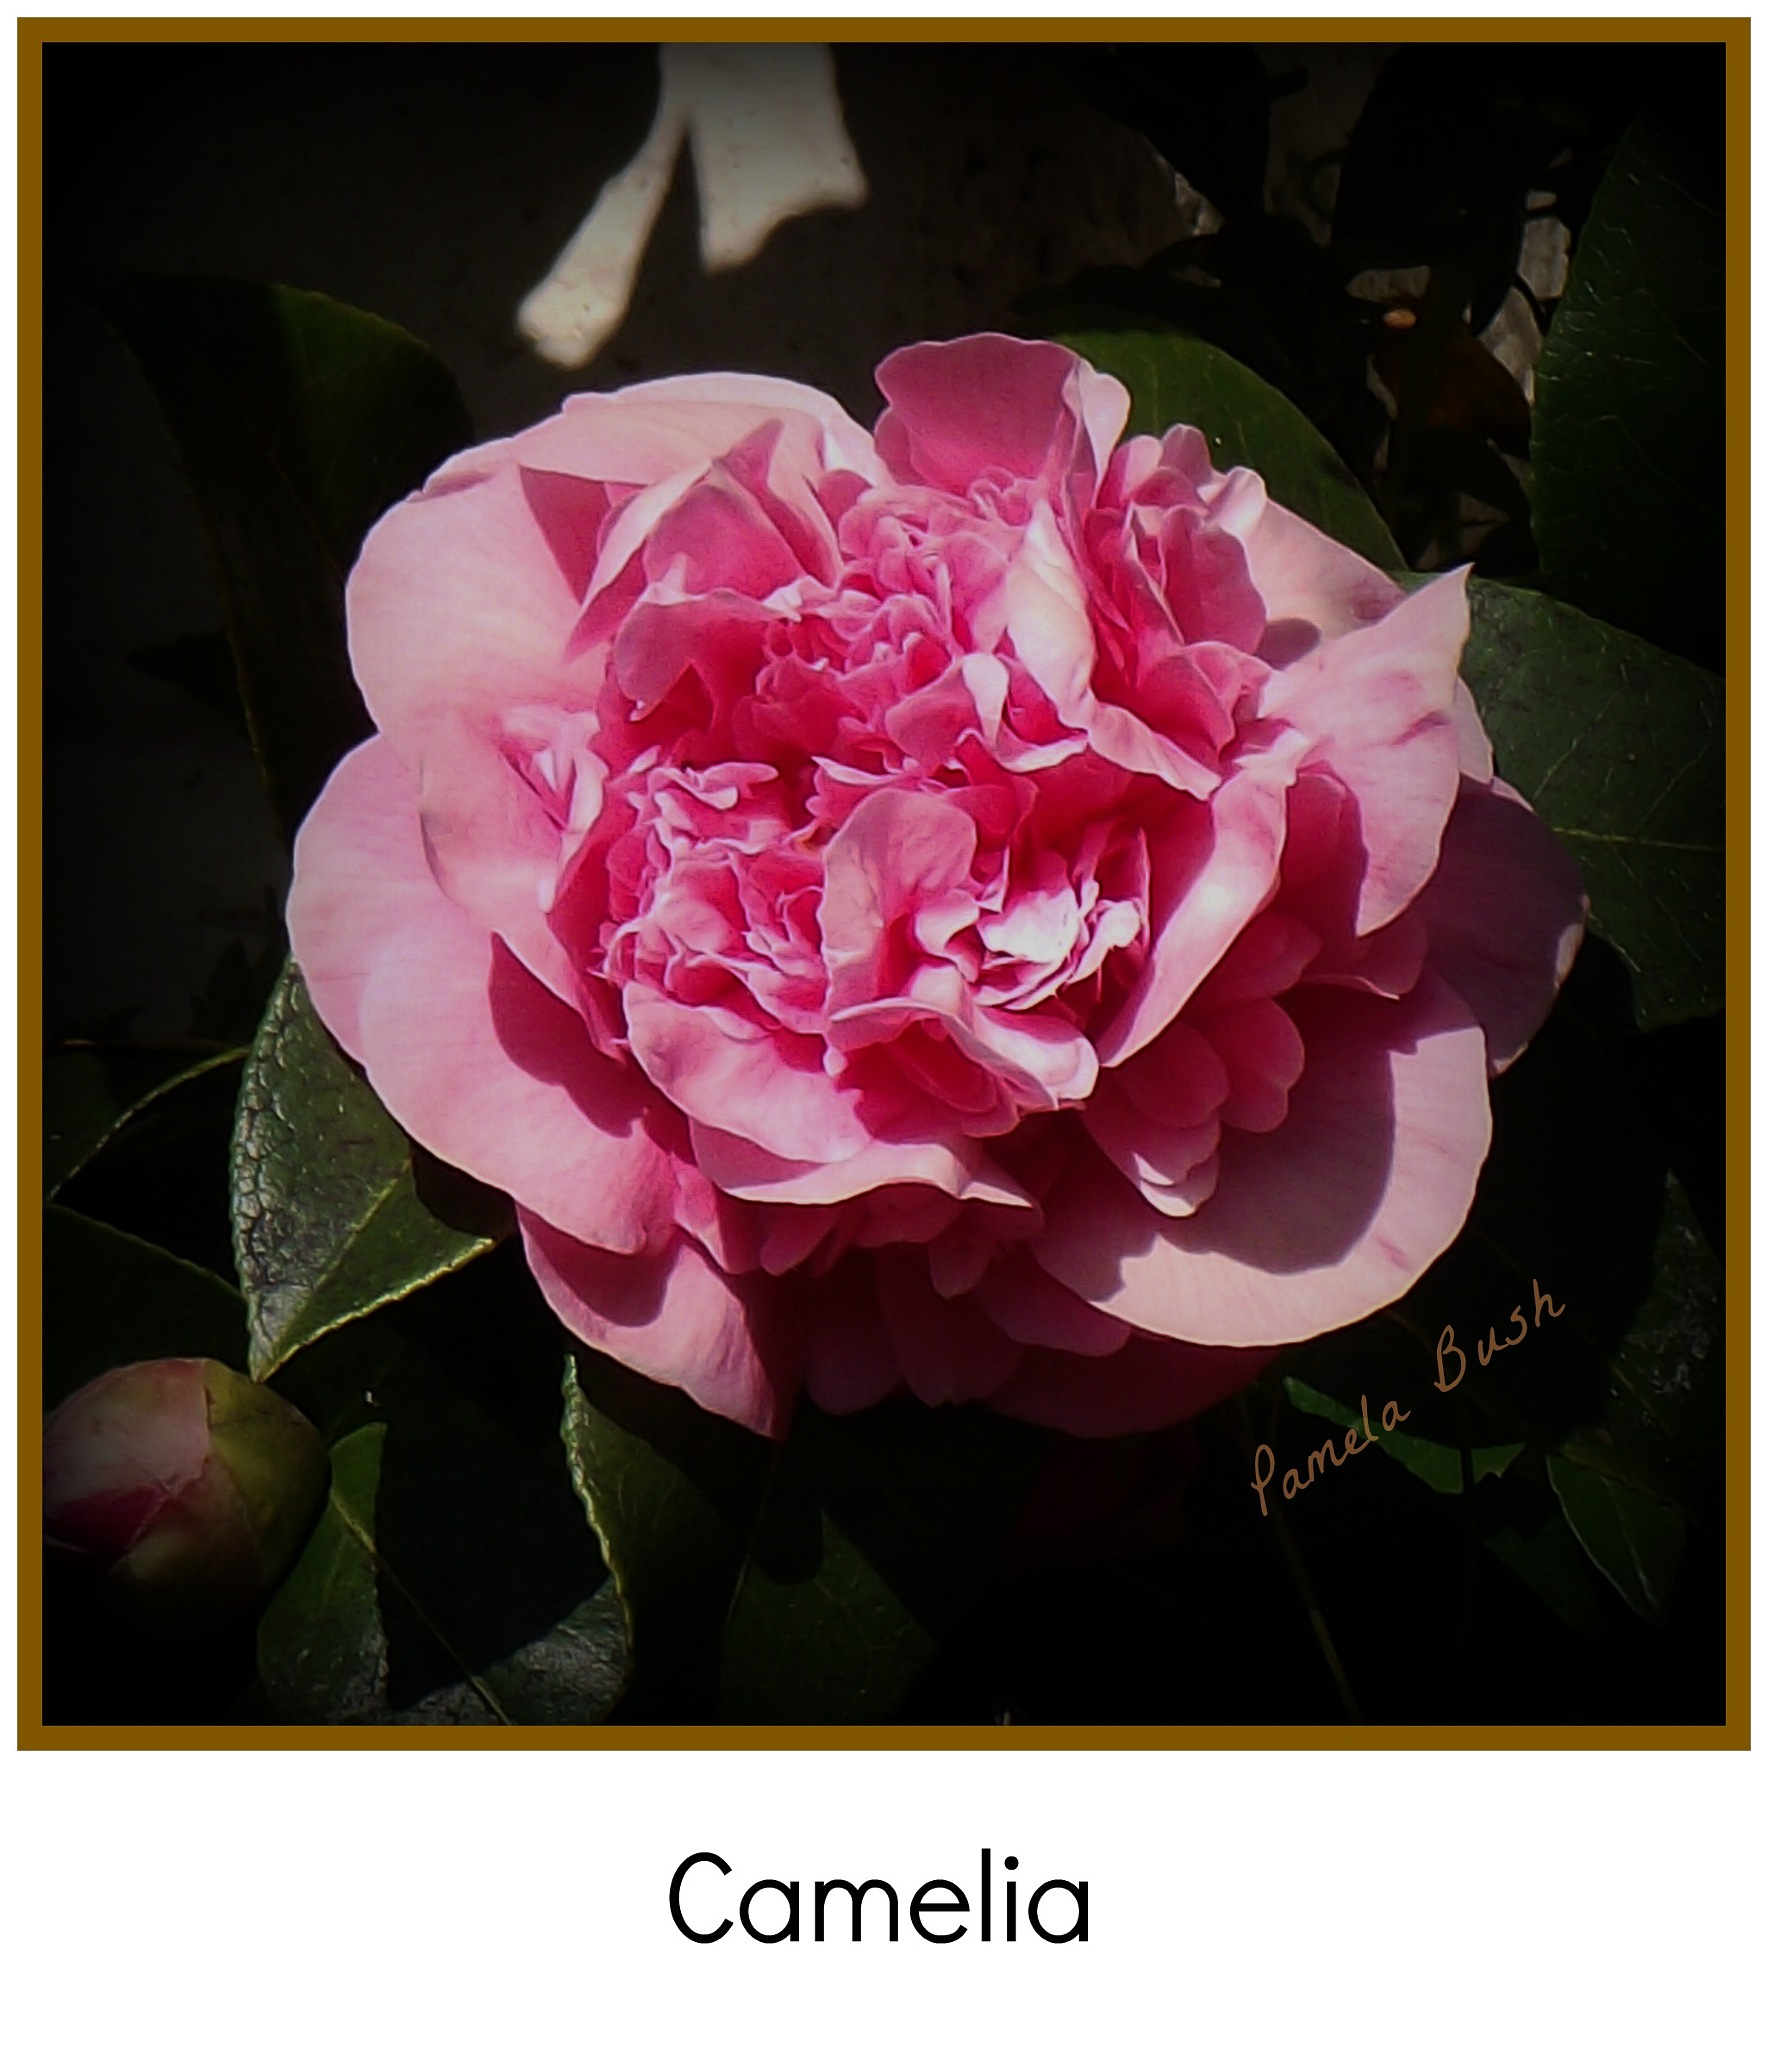 Camelia by Cumbria Ladd